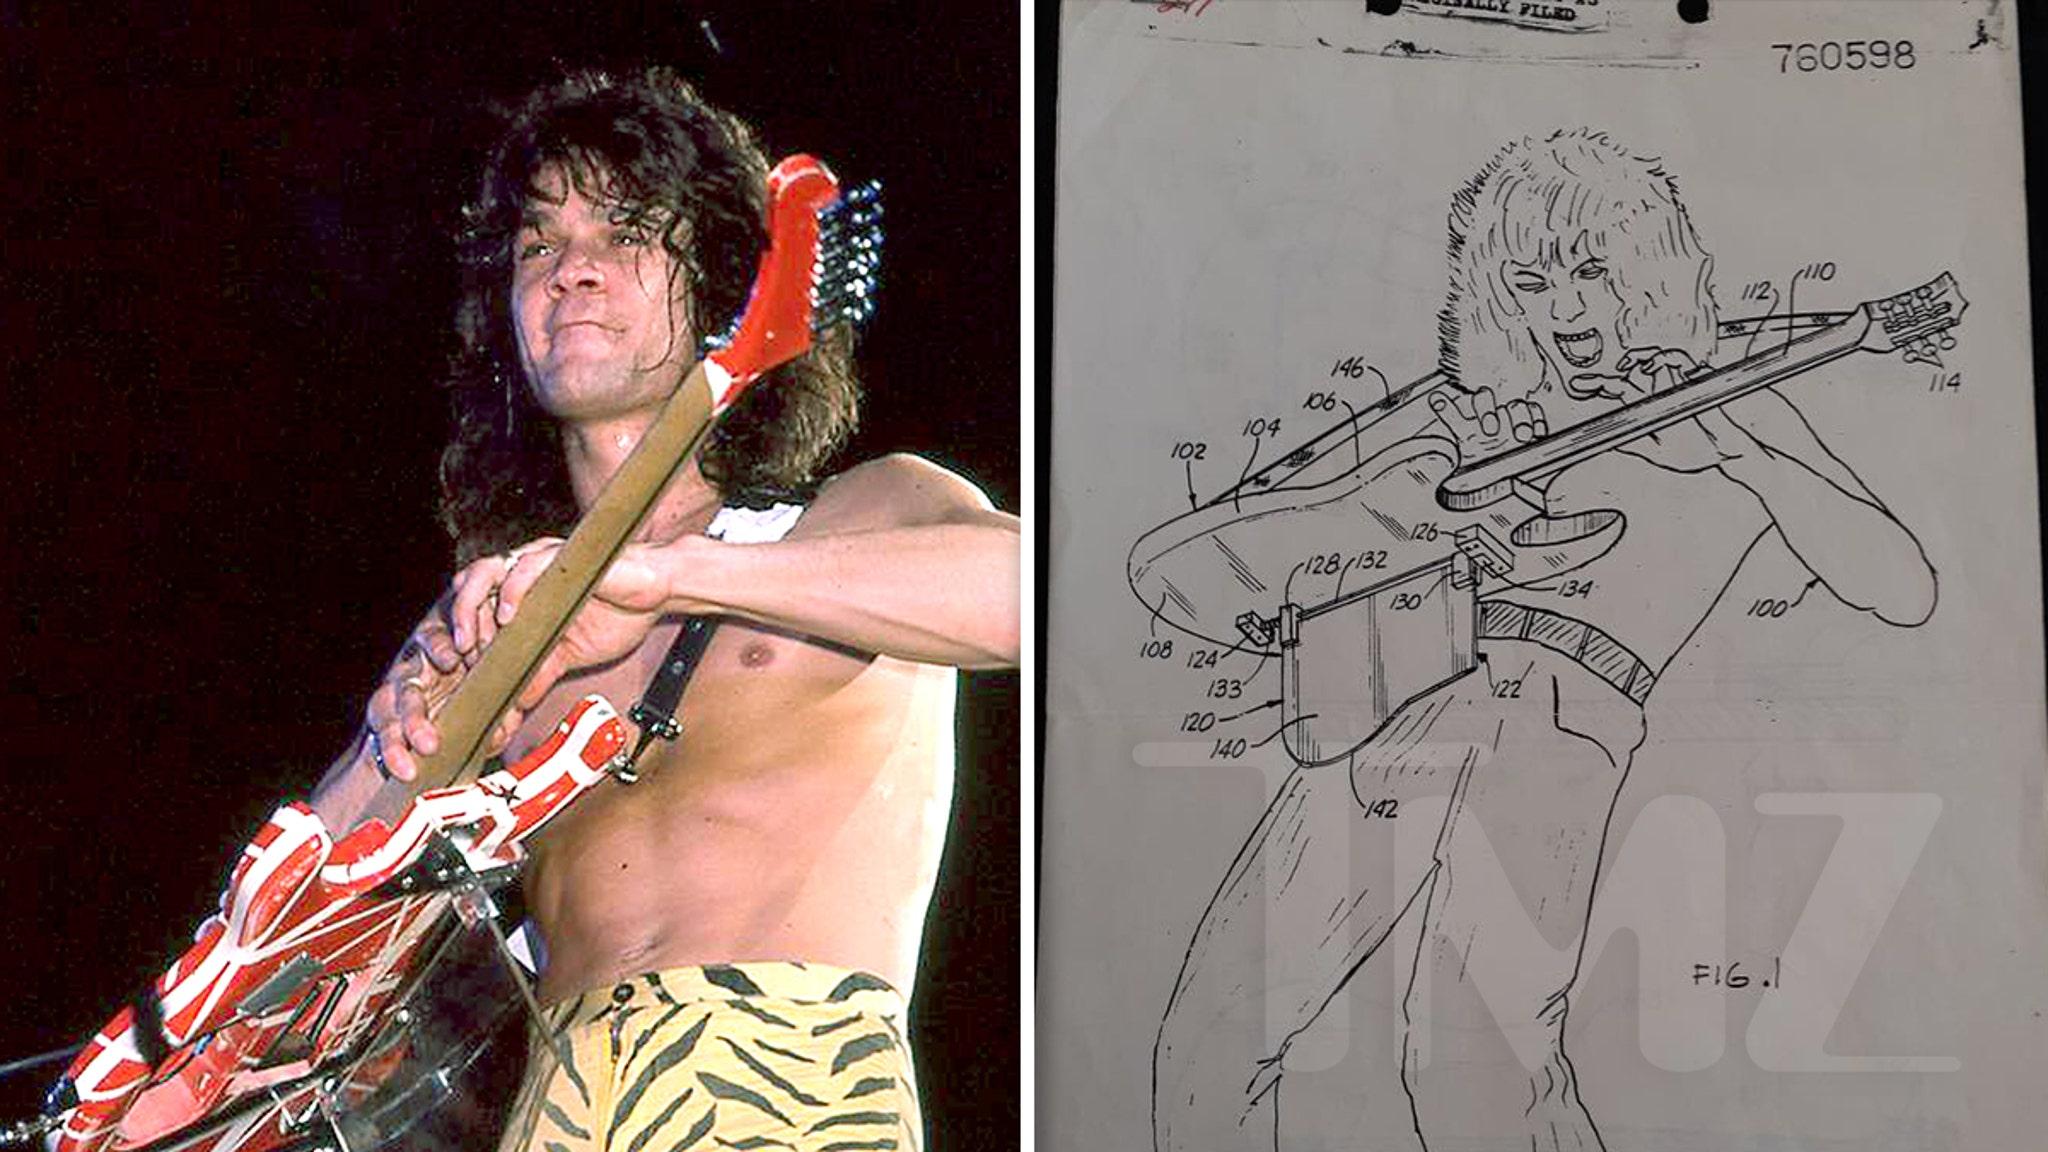 Eddie Van Halen's Original Guitar Body Rest Patent Up for Sale